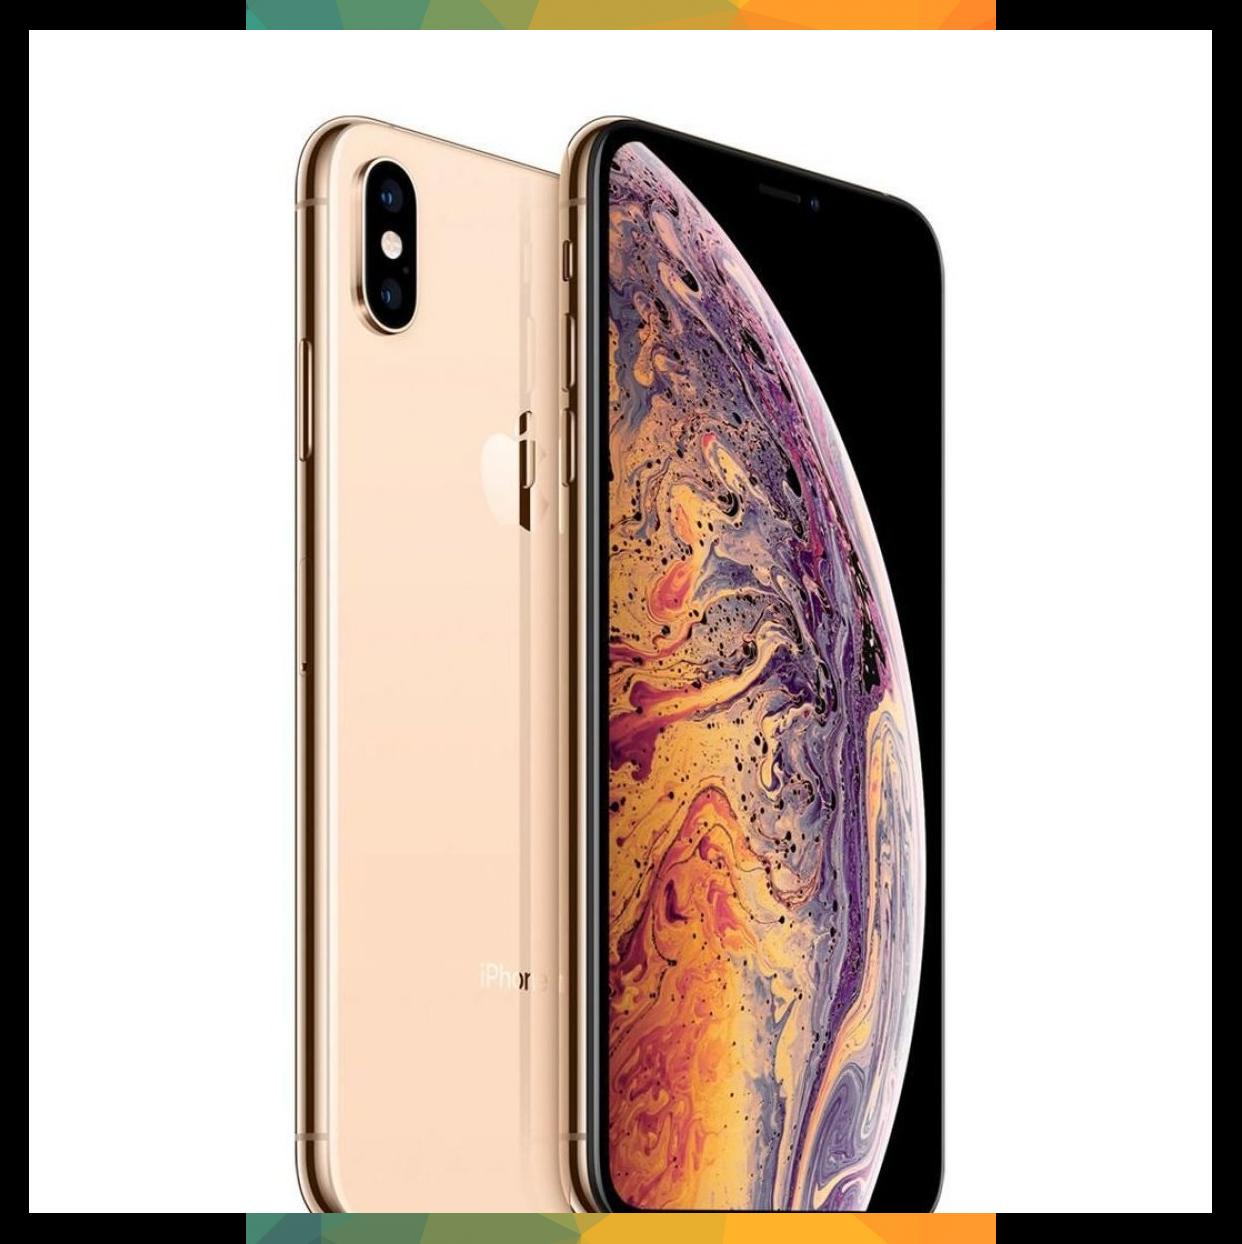 Iphone Xs Max 64gb Gold At T Br 64gb Att Gold Iphone Max Apple Iphone Iphone 64gb